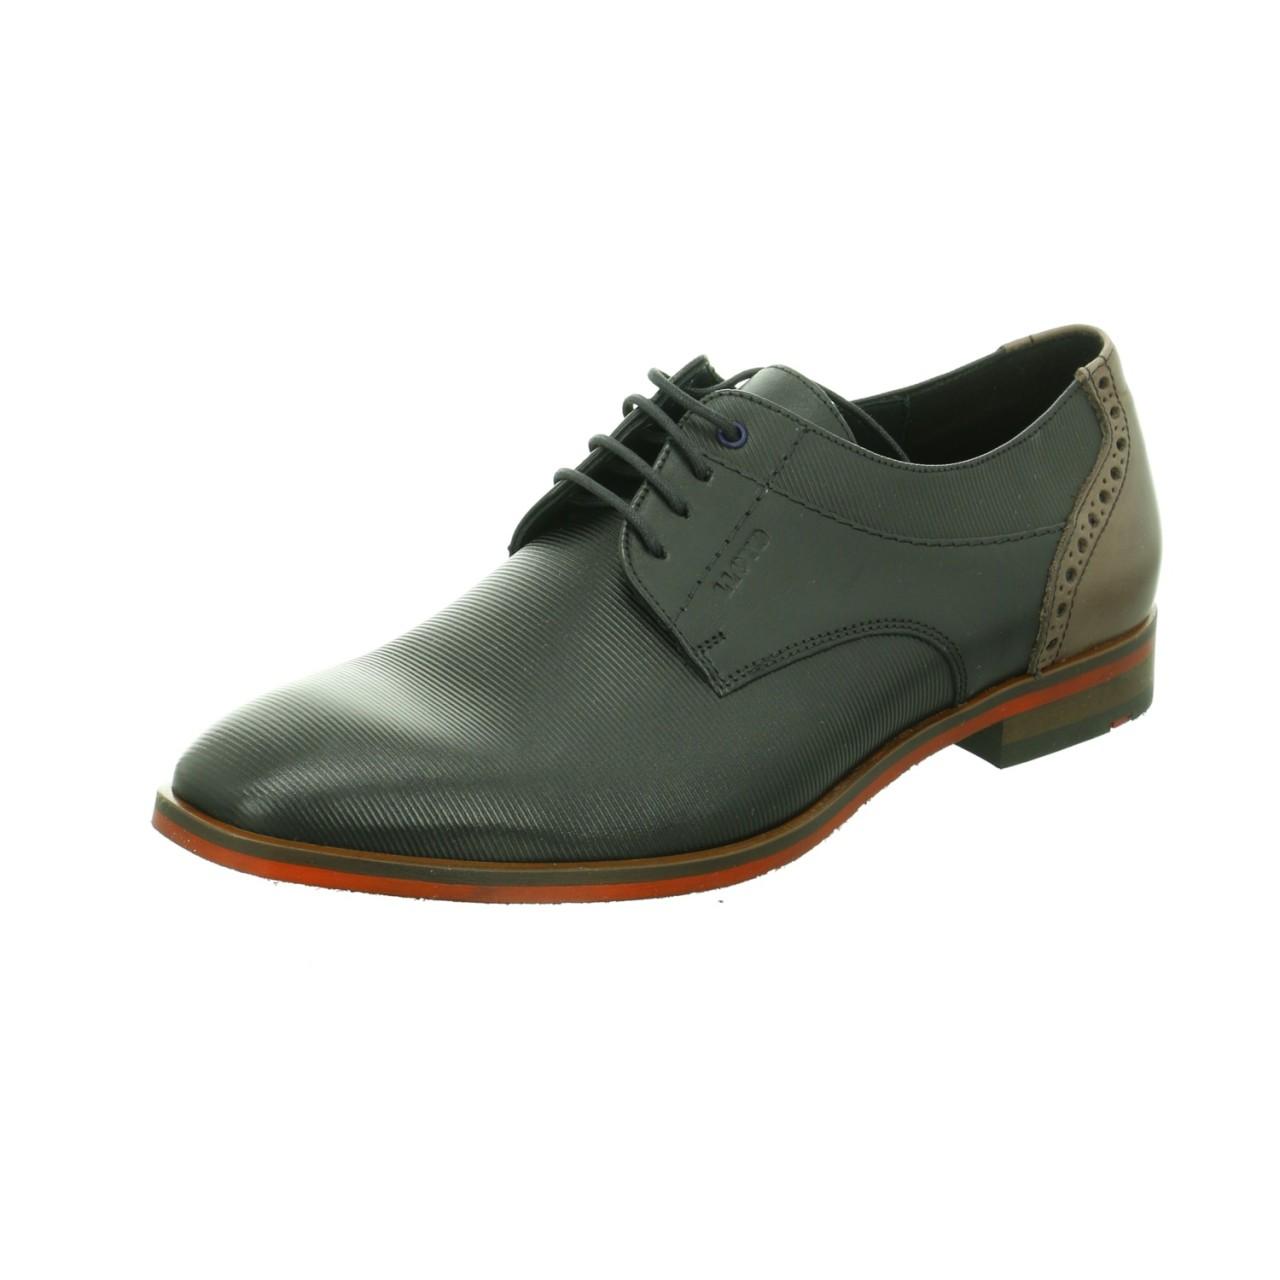 Lloyd Business Schuhe schwarz HAMILTON schwarz